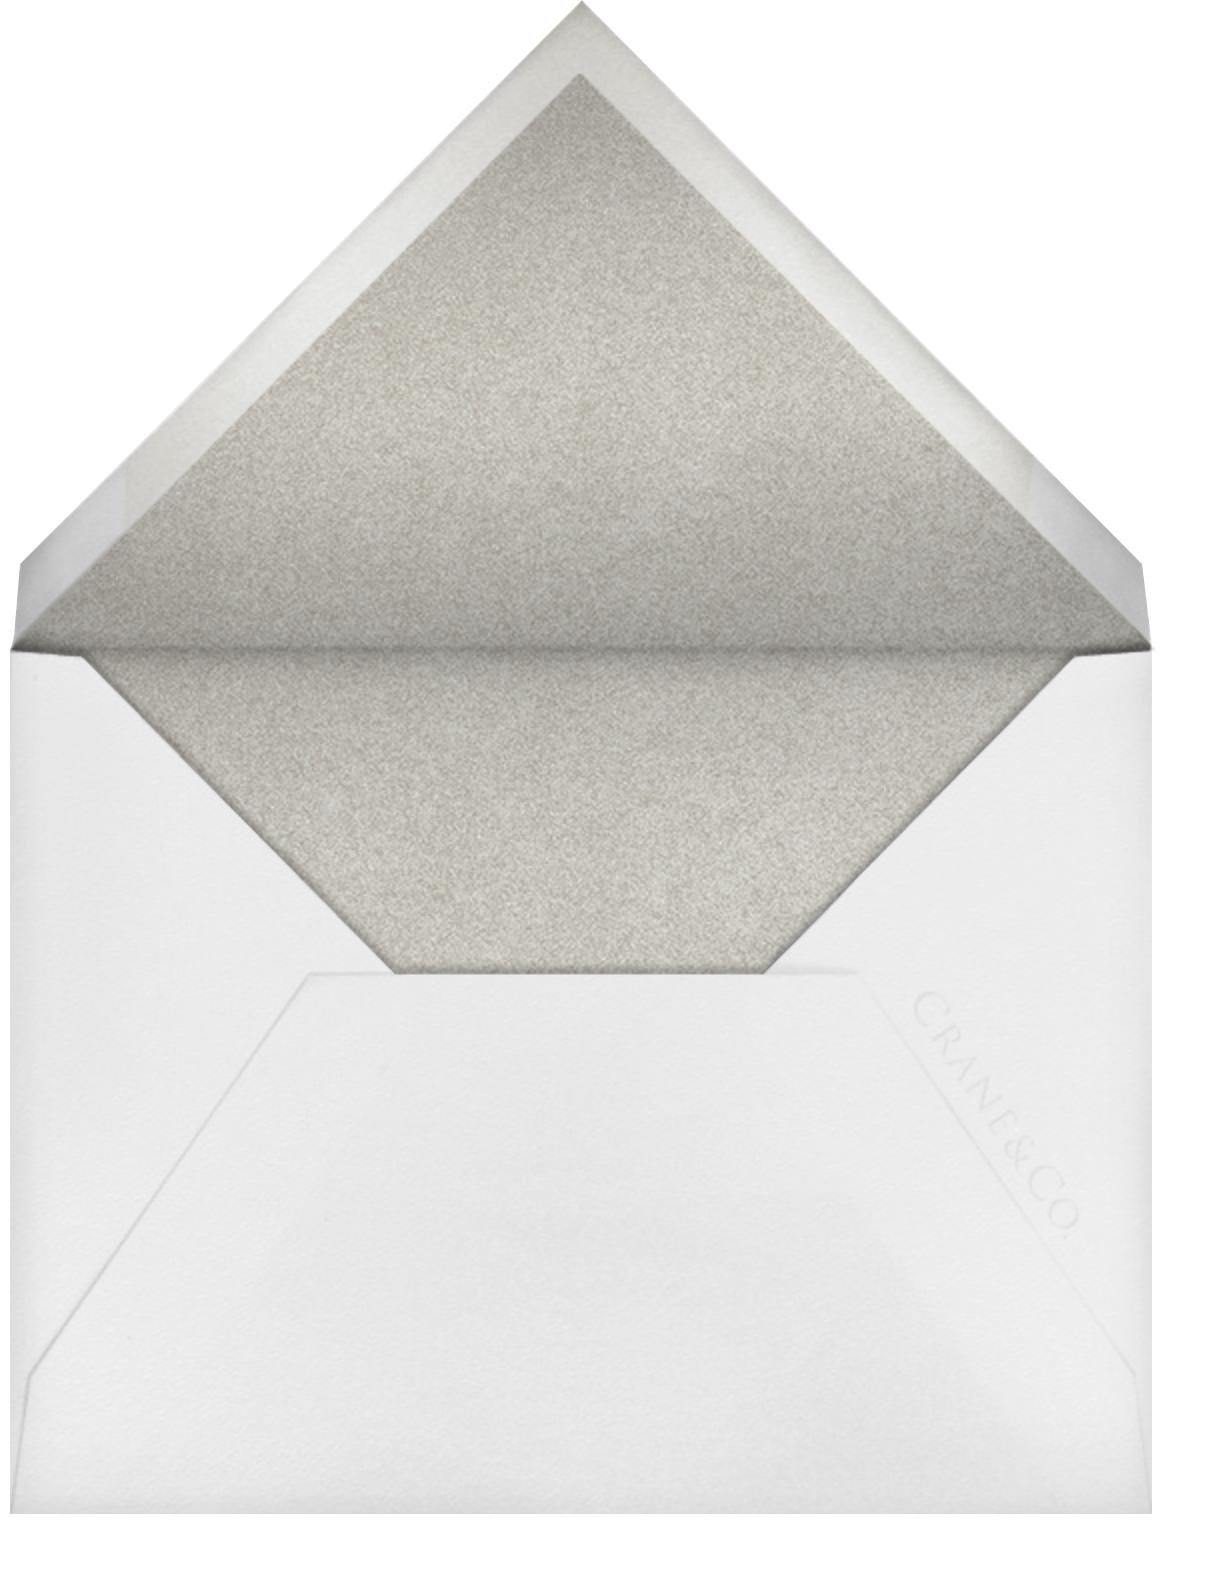 Notch - Platinum - Vera Wang - Engagement party - envelope back